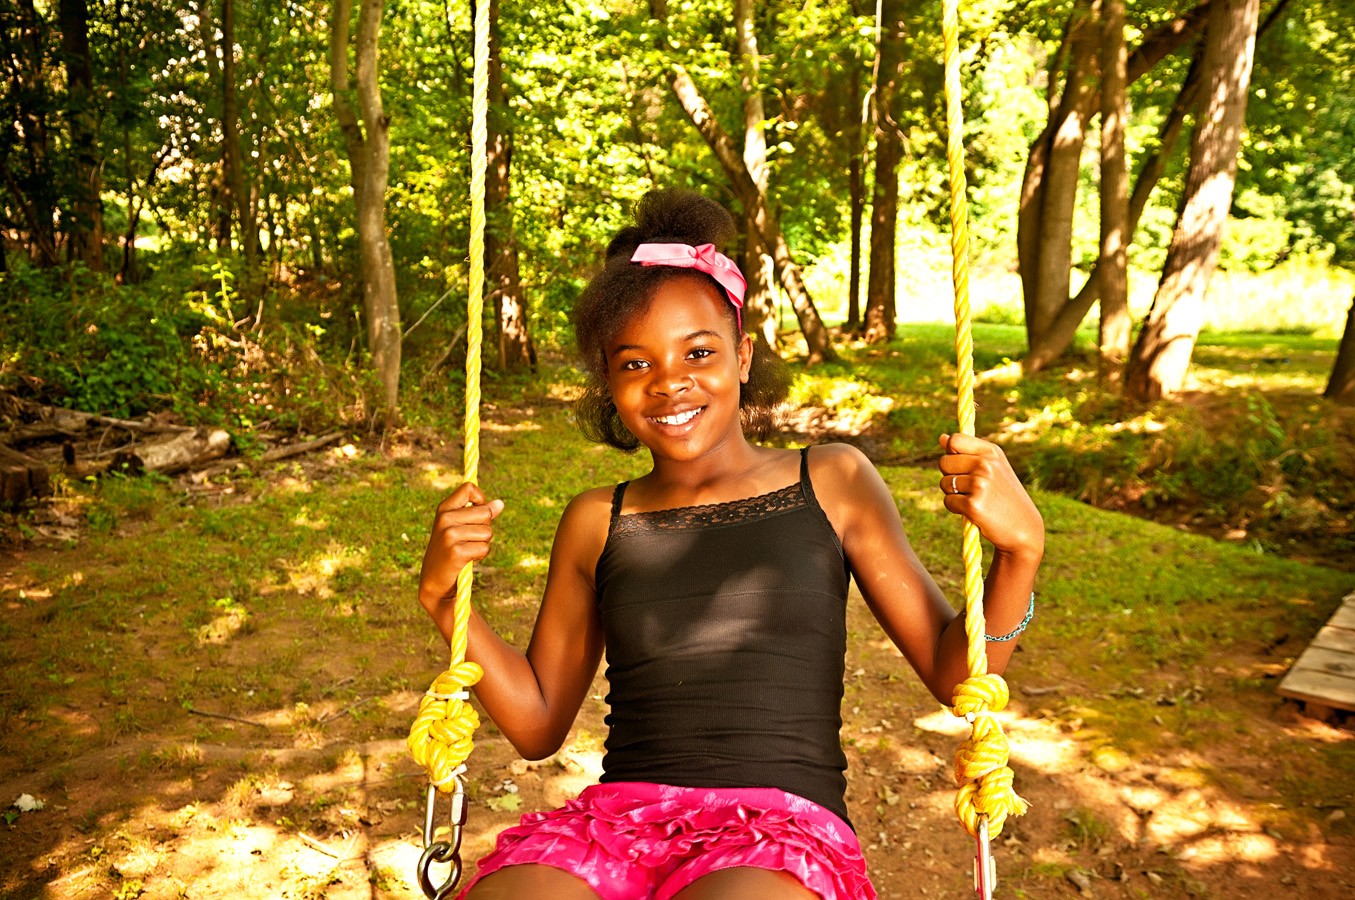 child, portrait, outdoor, swing, natural light, Northern VA